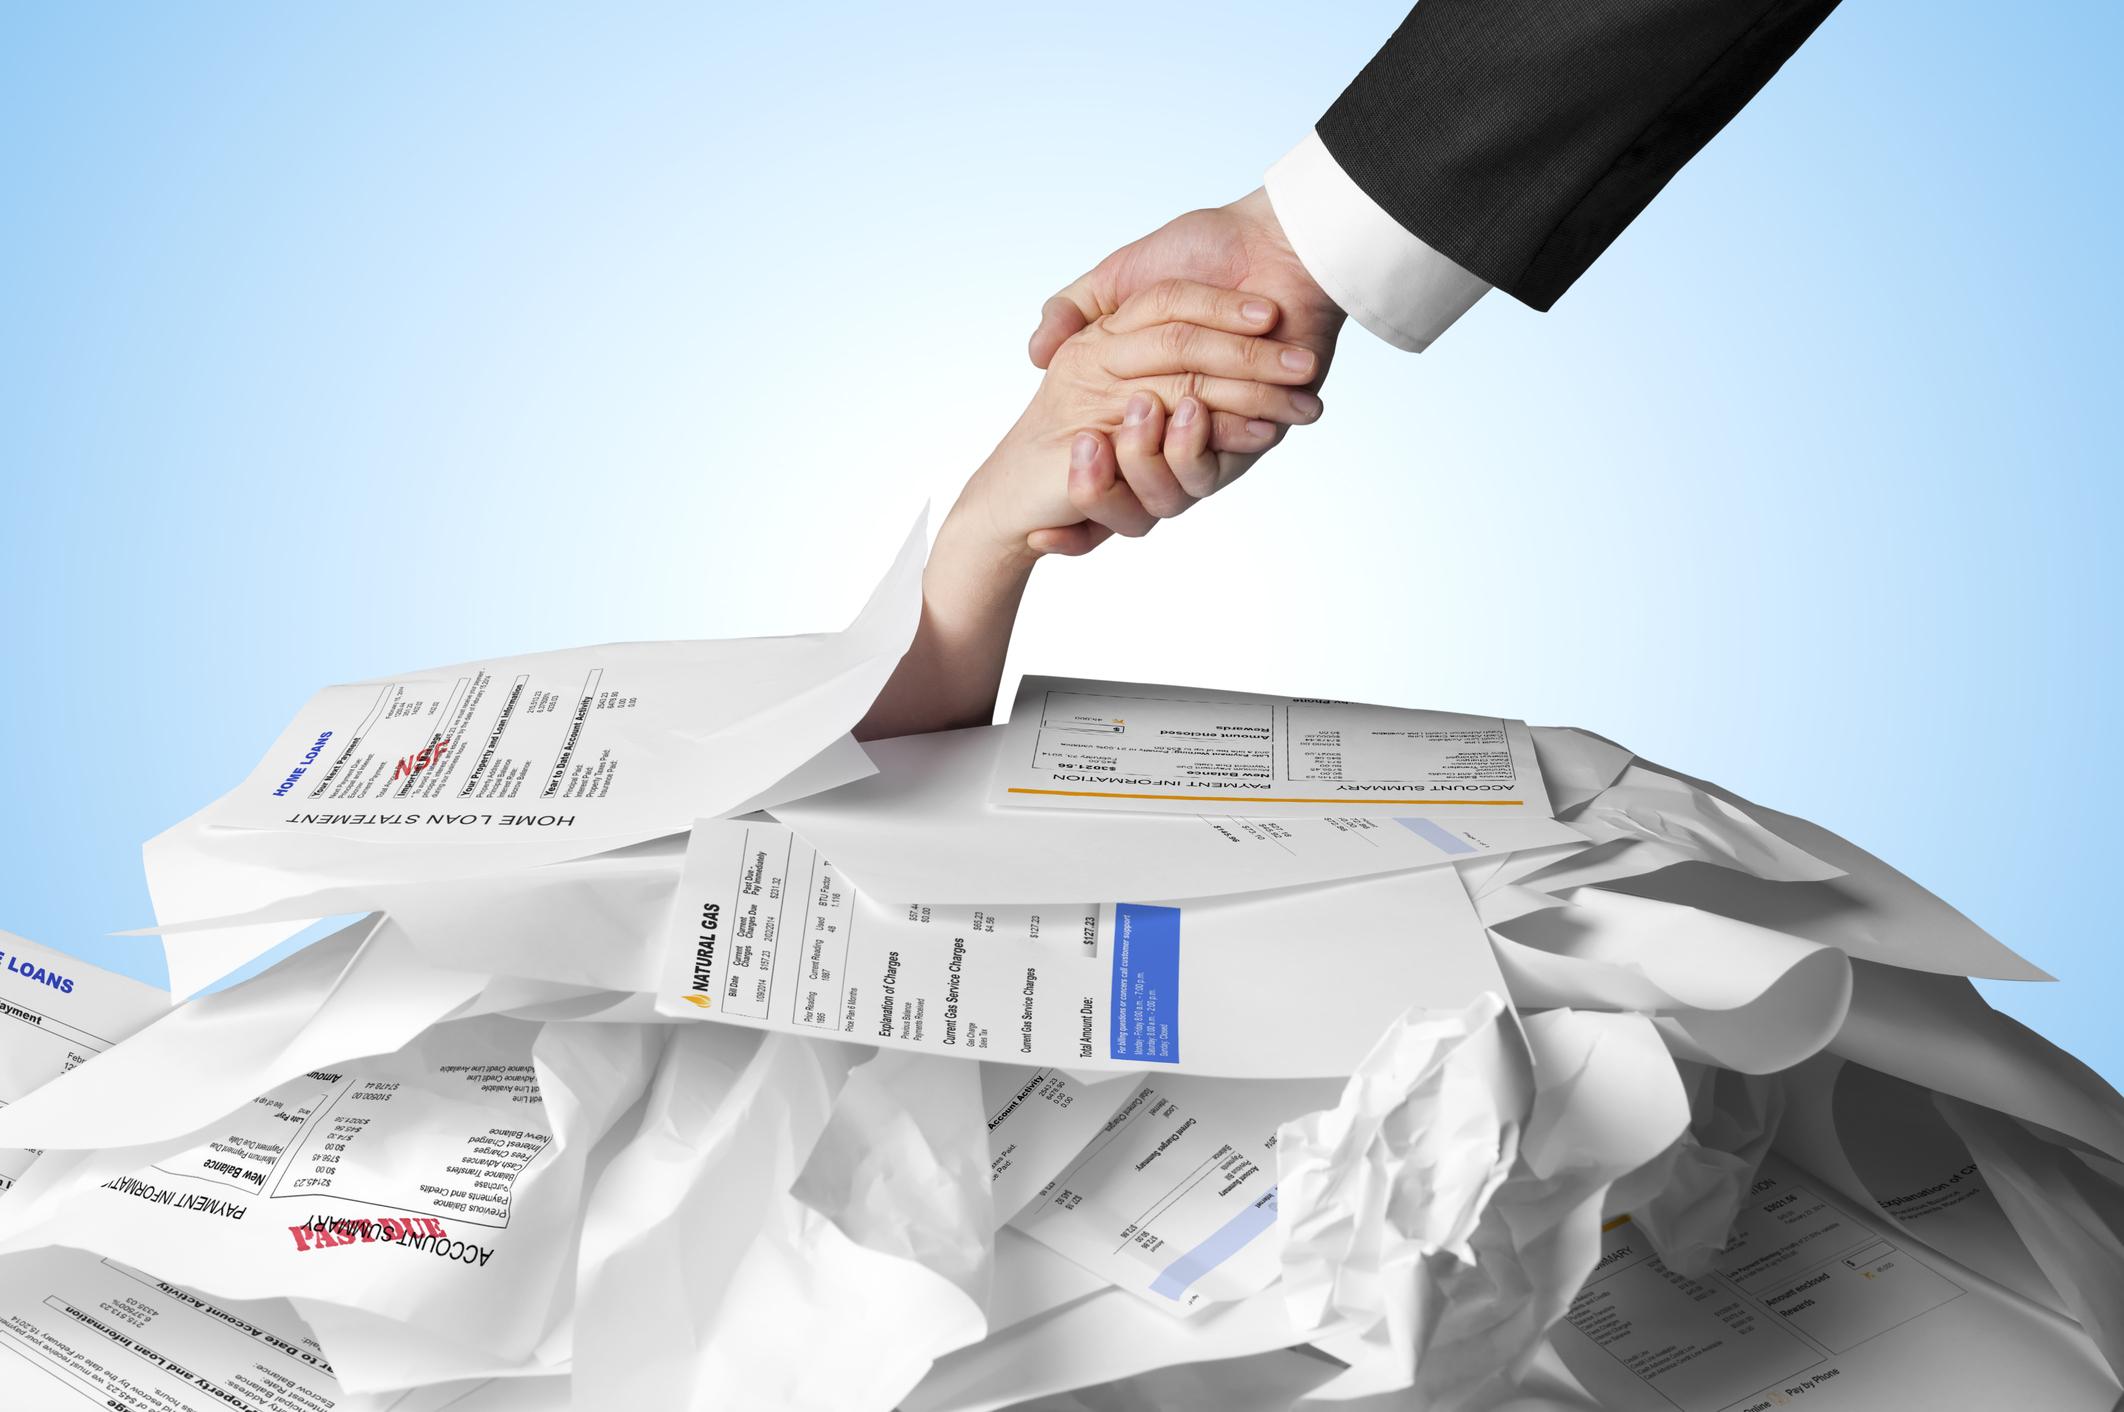 guide-to-shredding-complete-shredding-solutions